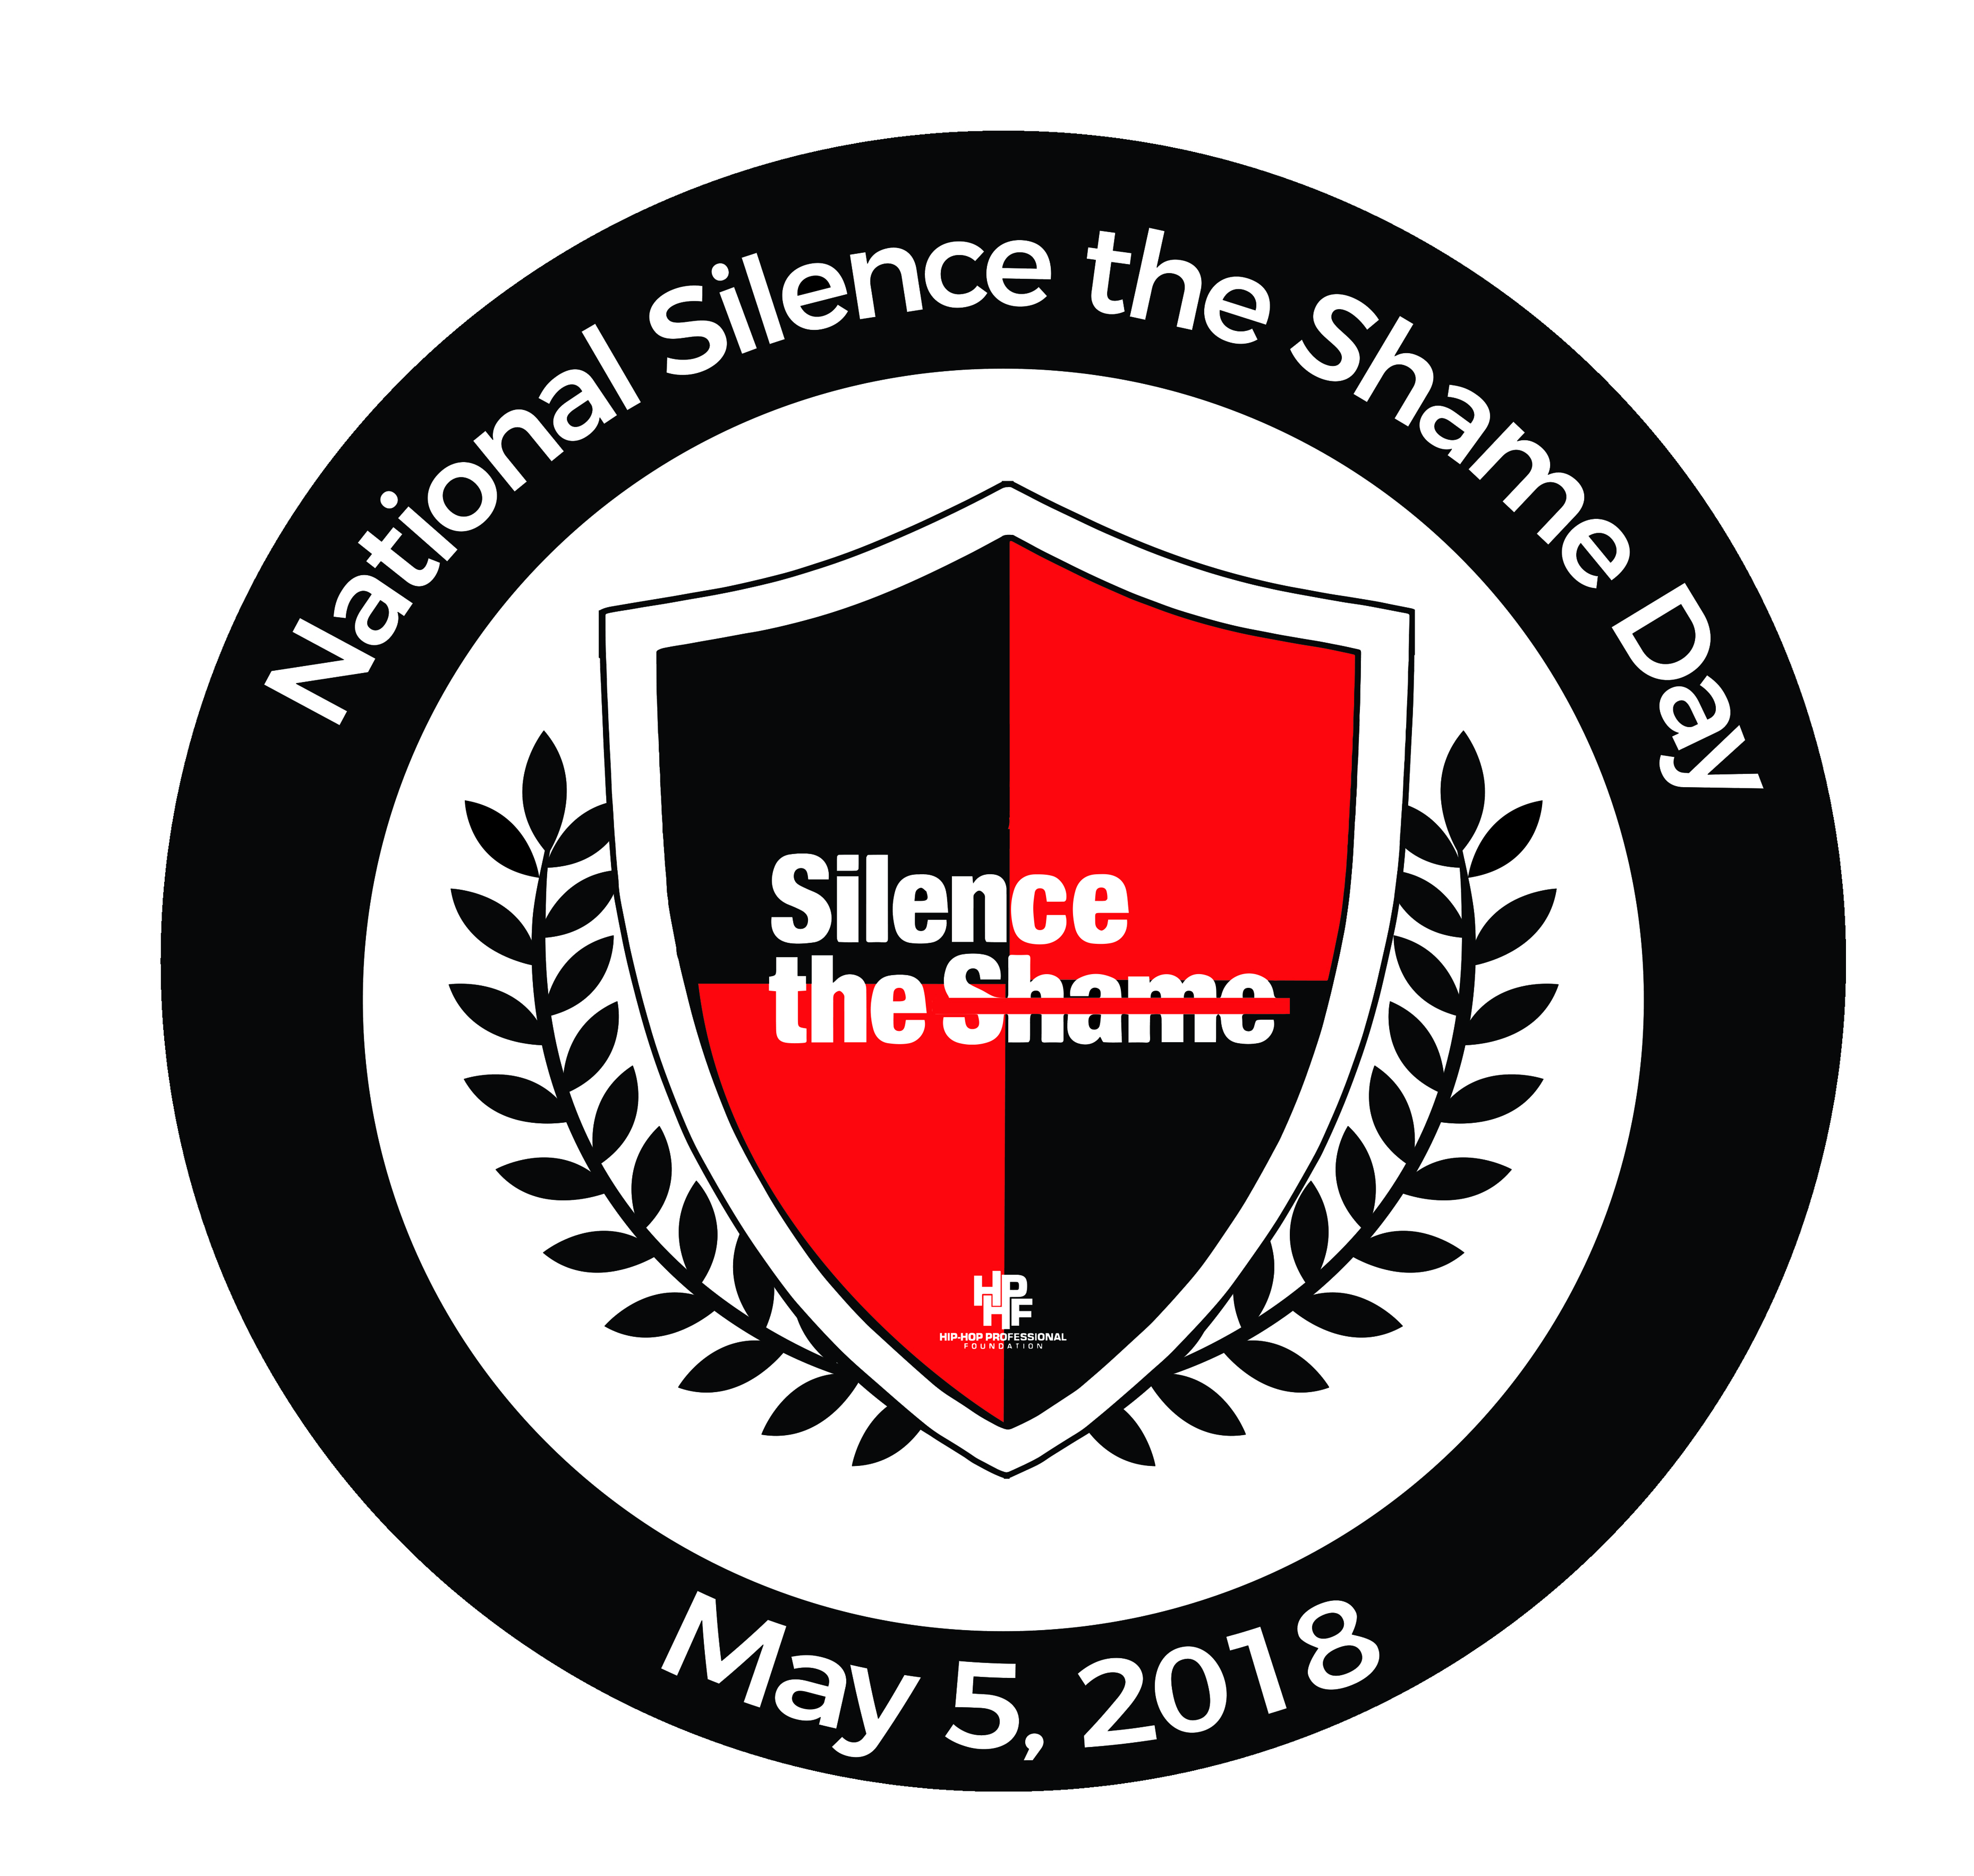 National Silence the Shame Day